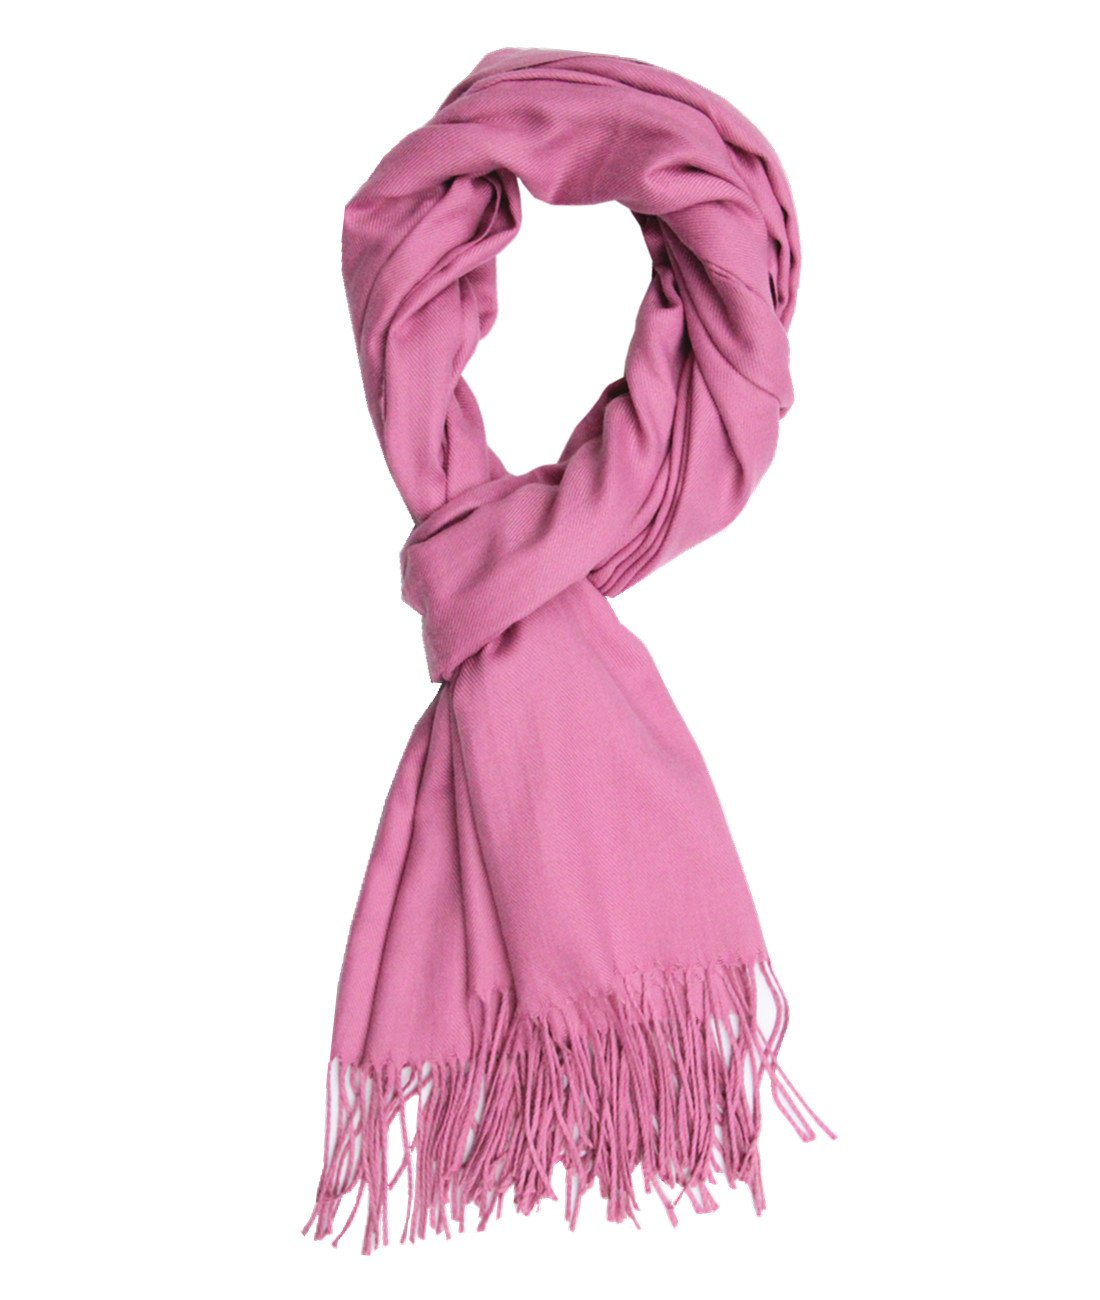 Saferin Men Women Winter Plaid Soft Elegant Cashmere Feel Wrap Scarf (Solid Dark Pink)